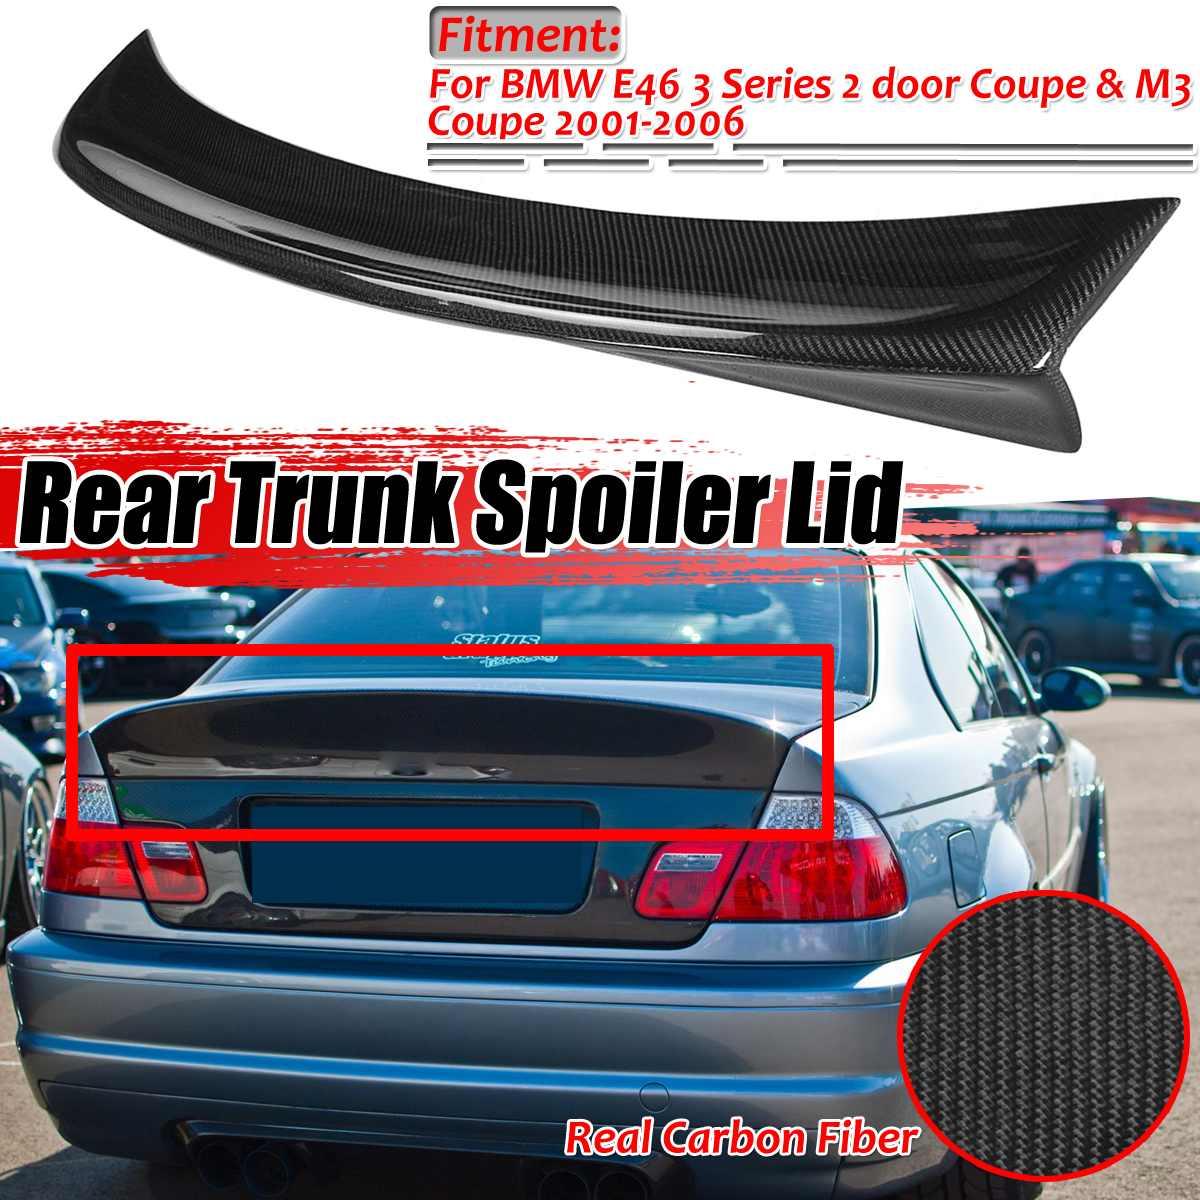 CSL estilo PU/Real fibra de carbono coche alerón trasero para maletero grande para BMW E46 3 Series 2 puertas para Coupé y M3 para coupé 2001-2006